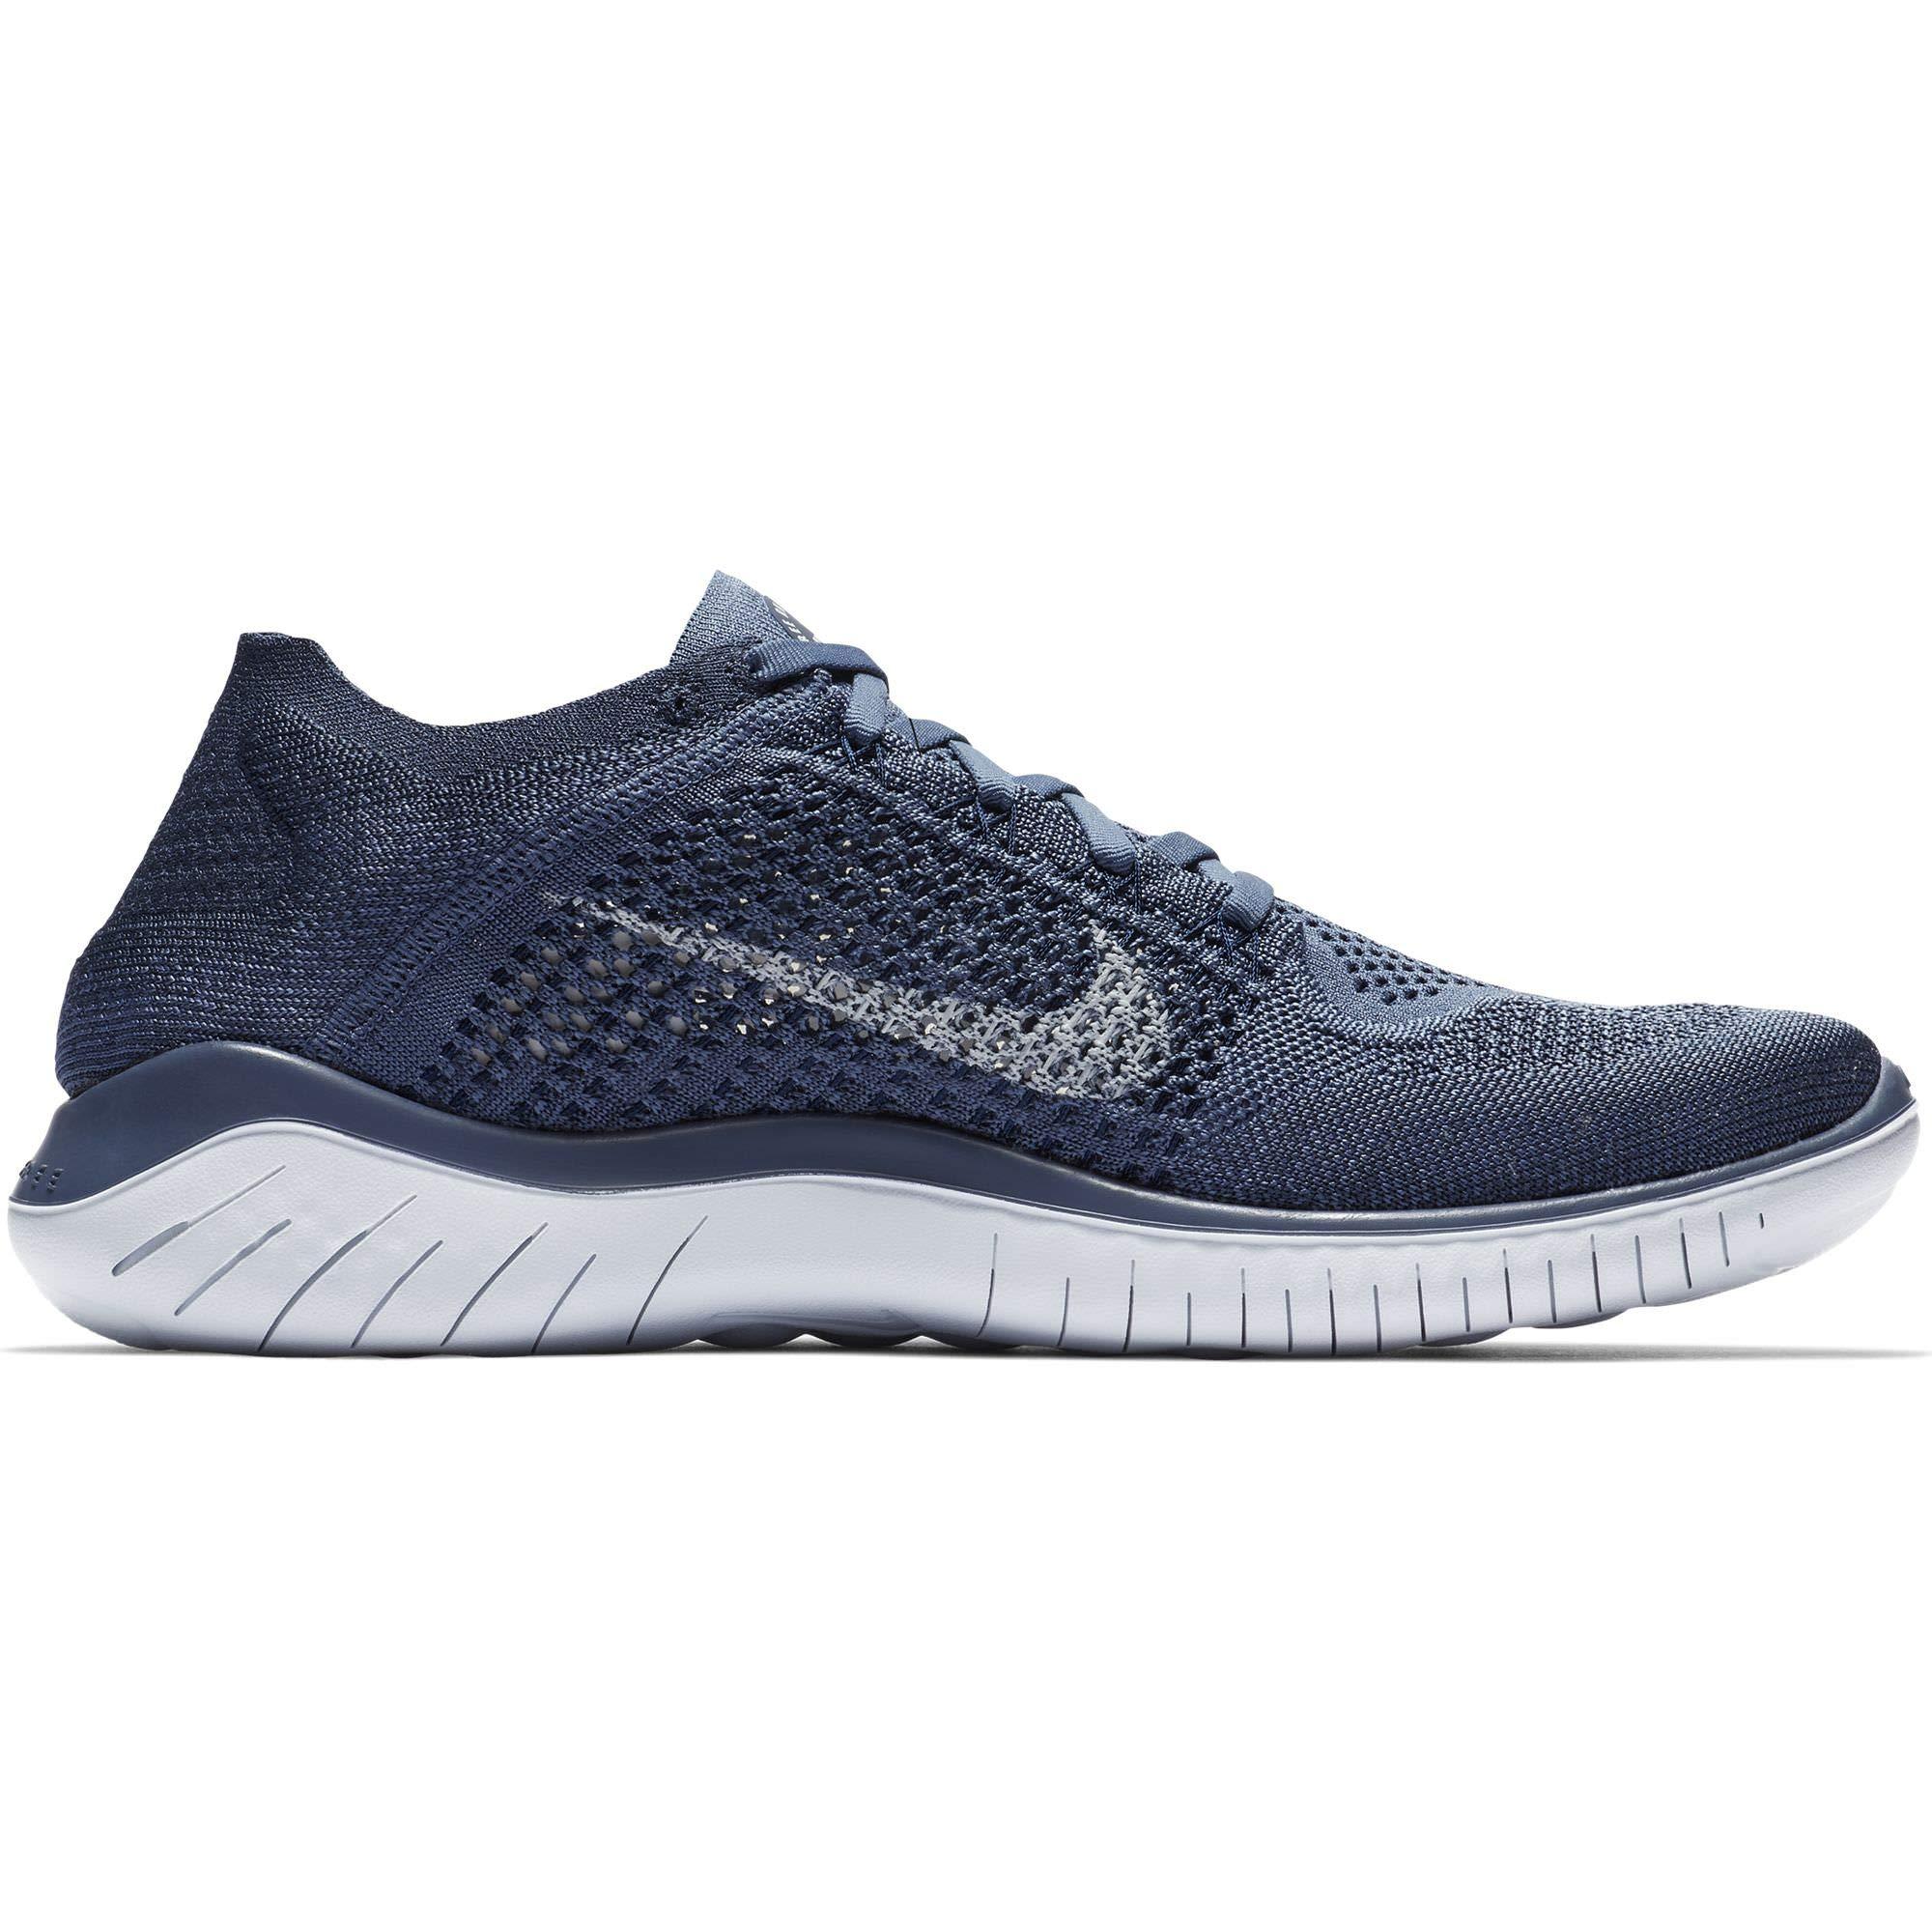 deab022d849 Galleon - NIKE Free RN Flyknit 2018 Men s Running Shoe DIFFUSED Blue Football  Grey-Thunder Blue 14.0